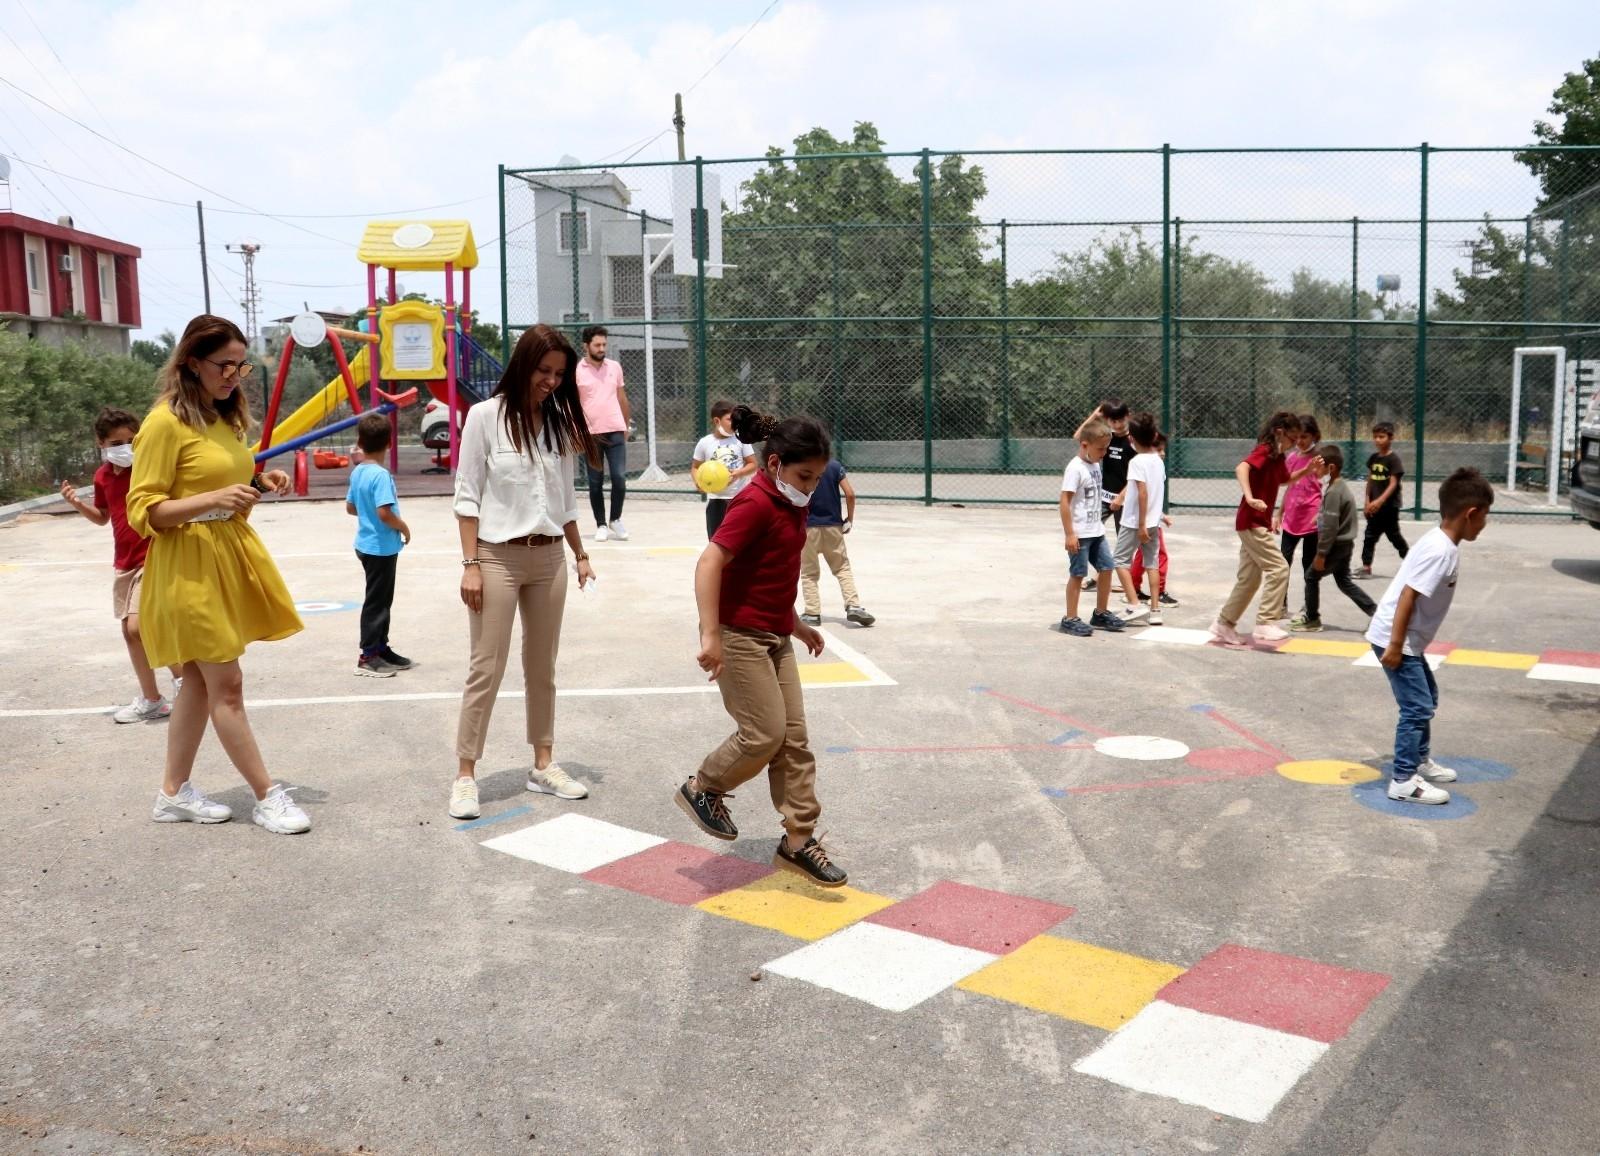 2021/06/okul-mudiresi-atandigi-harabe-koy-okuluna-adeta-hayat-verdi-20210610AW34-13.jpg